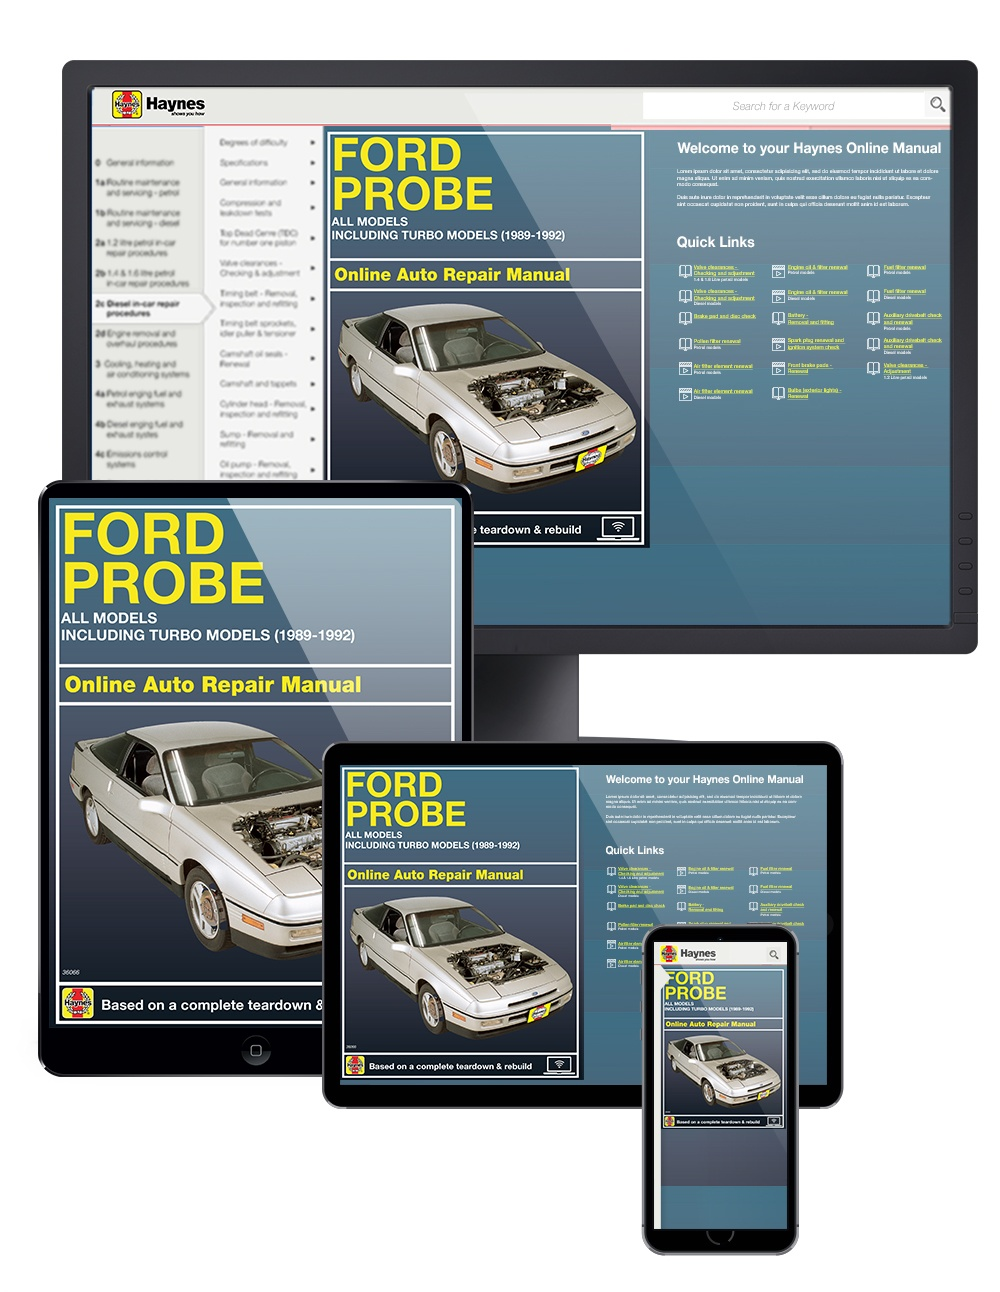 Ford Probe including Turbo Models (89-92) Haynes Online Manual